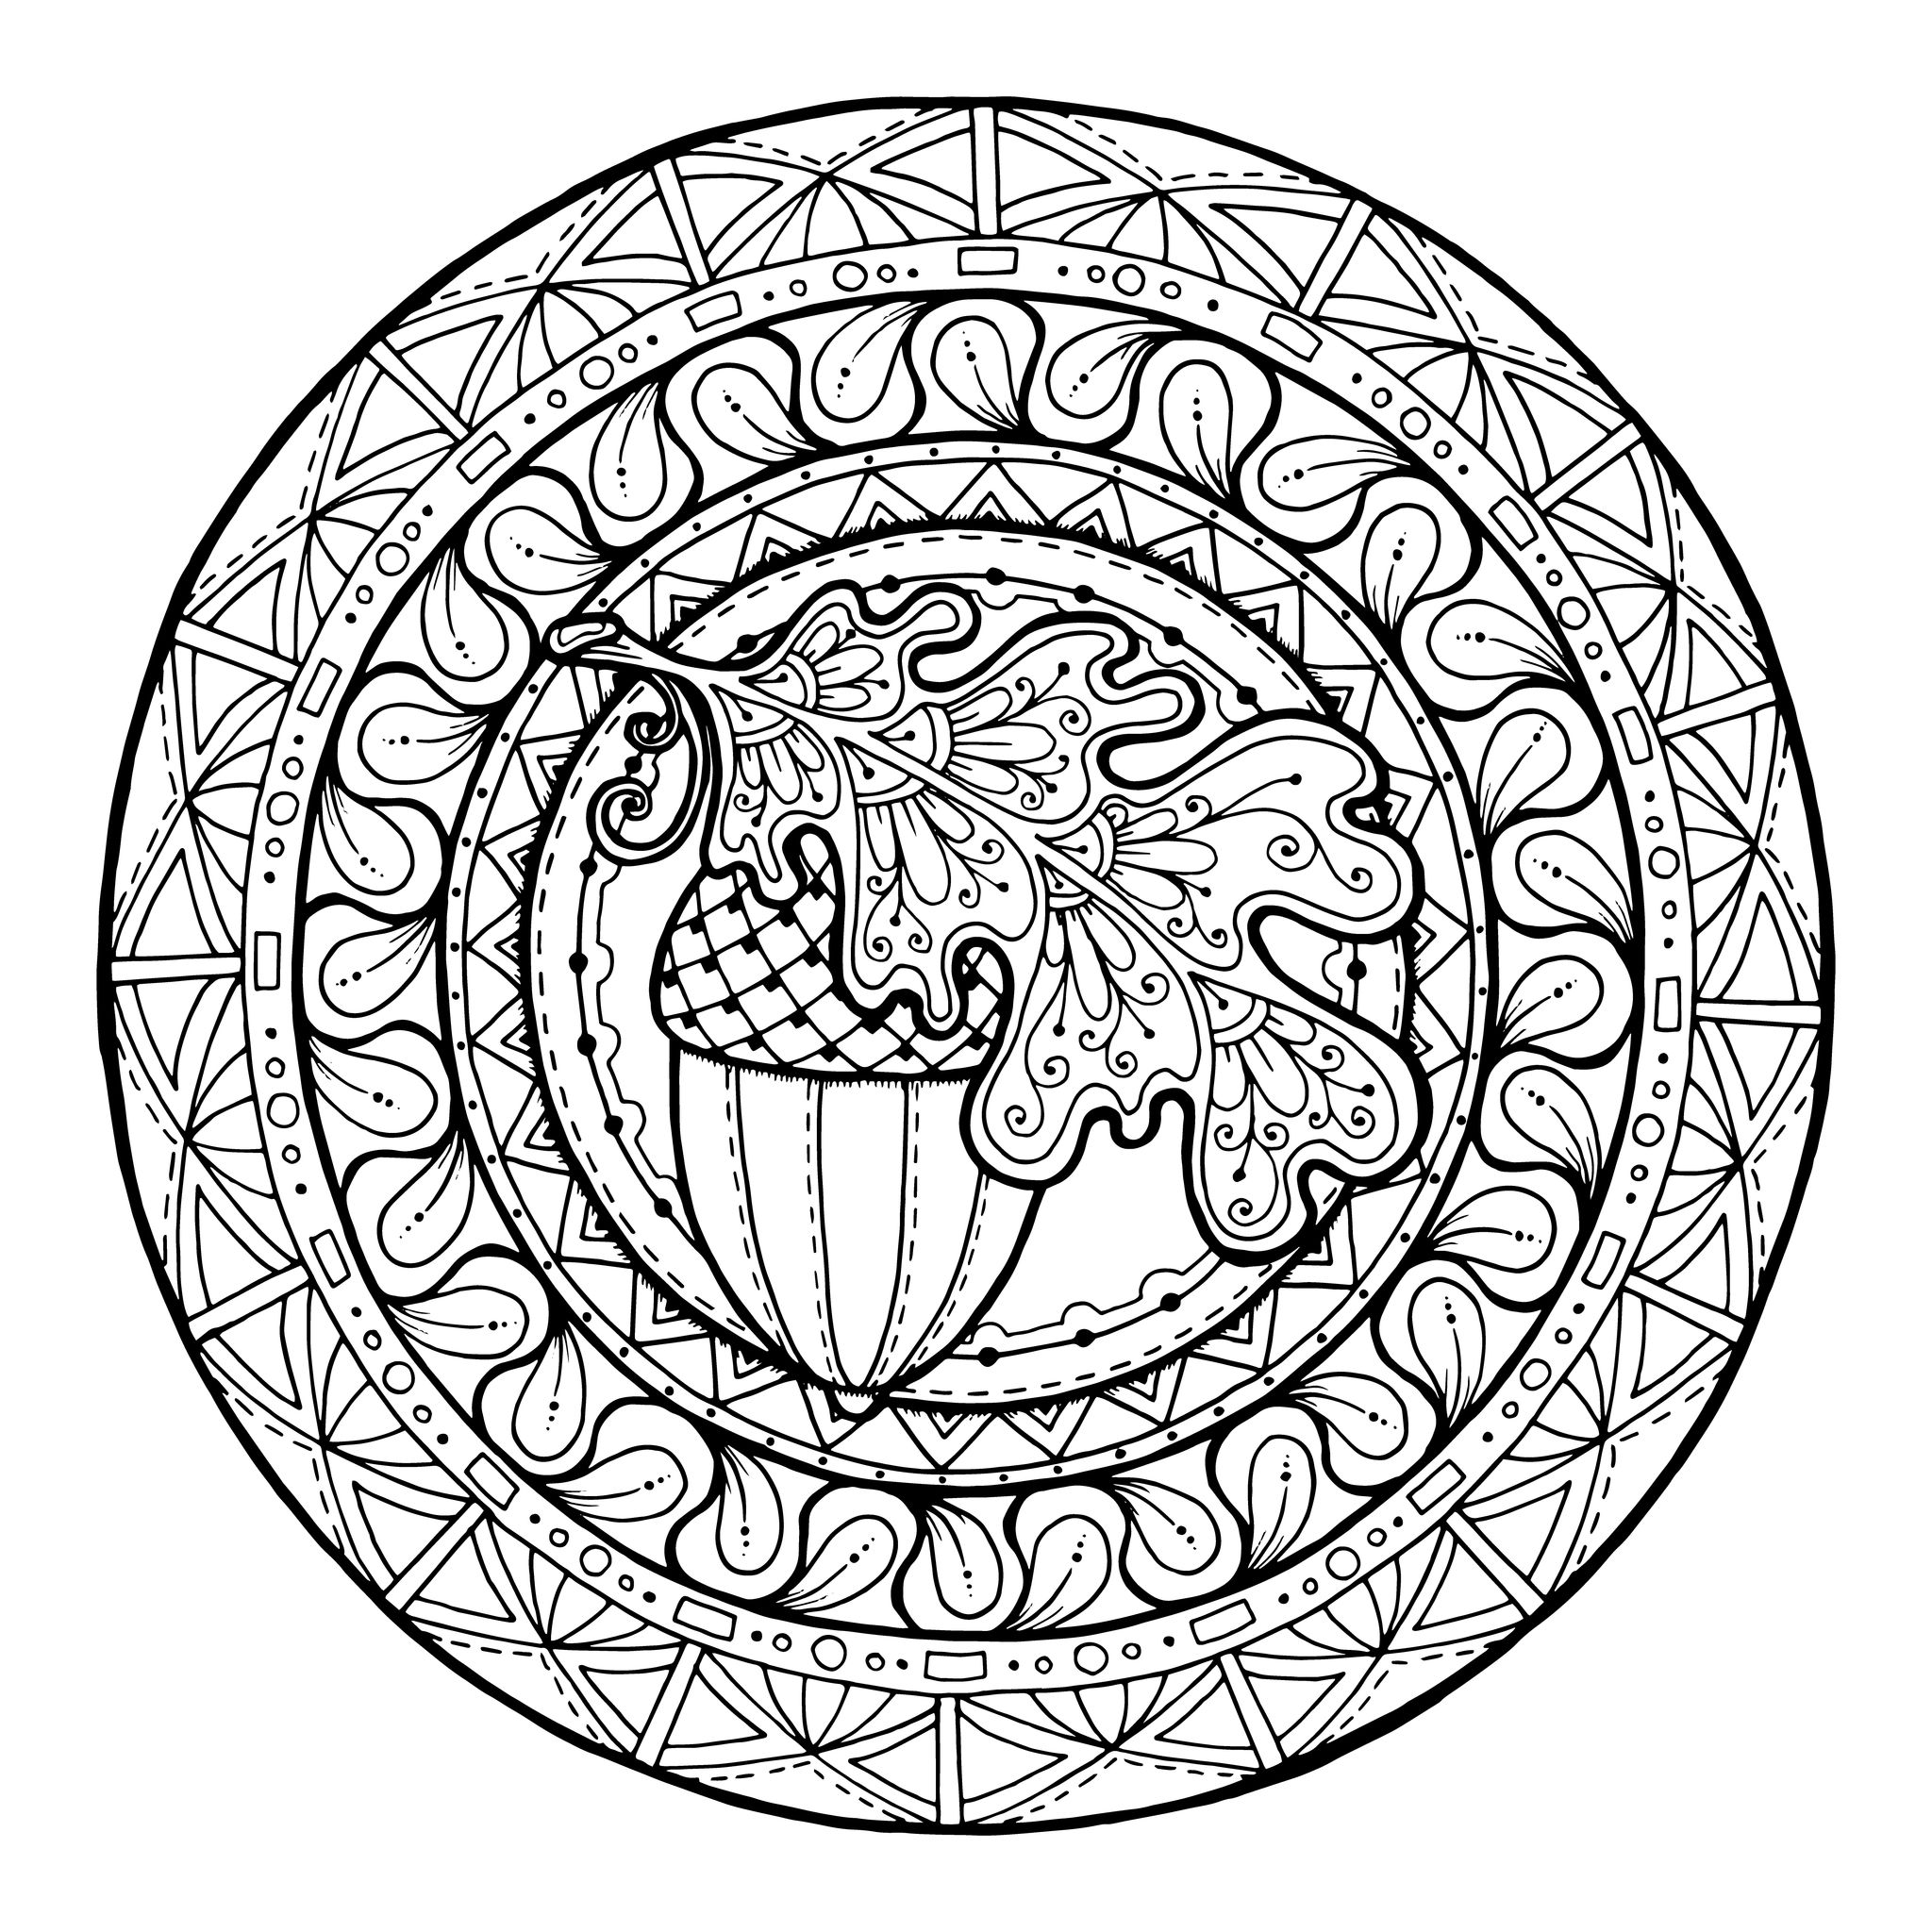 Mandala avec un joli gland au milieu